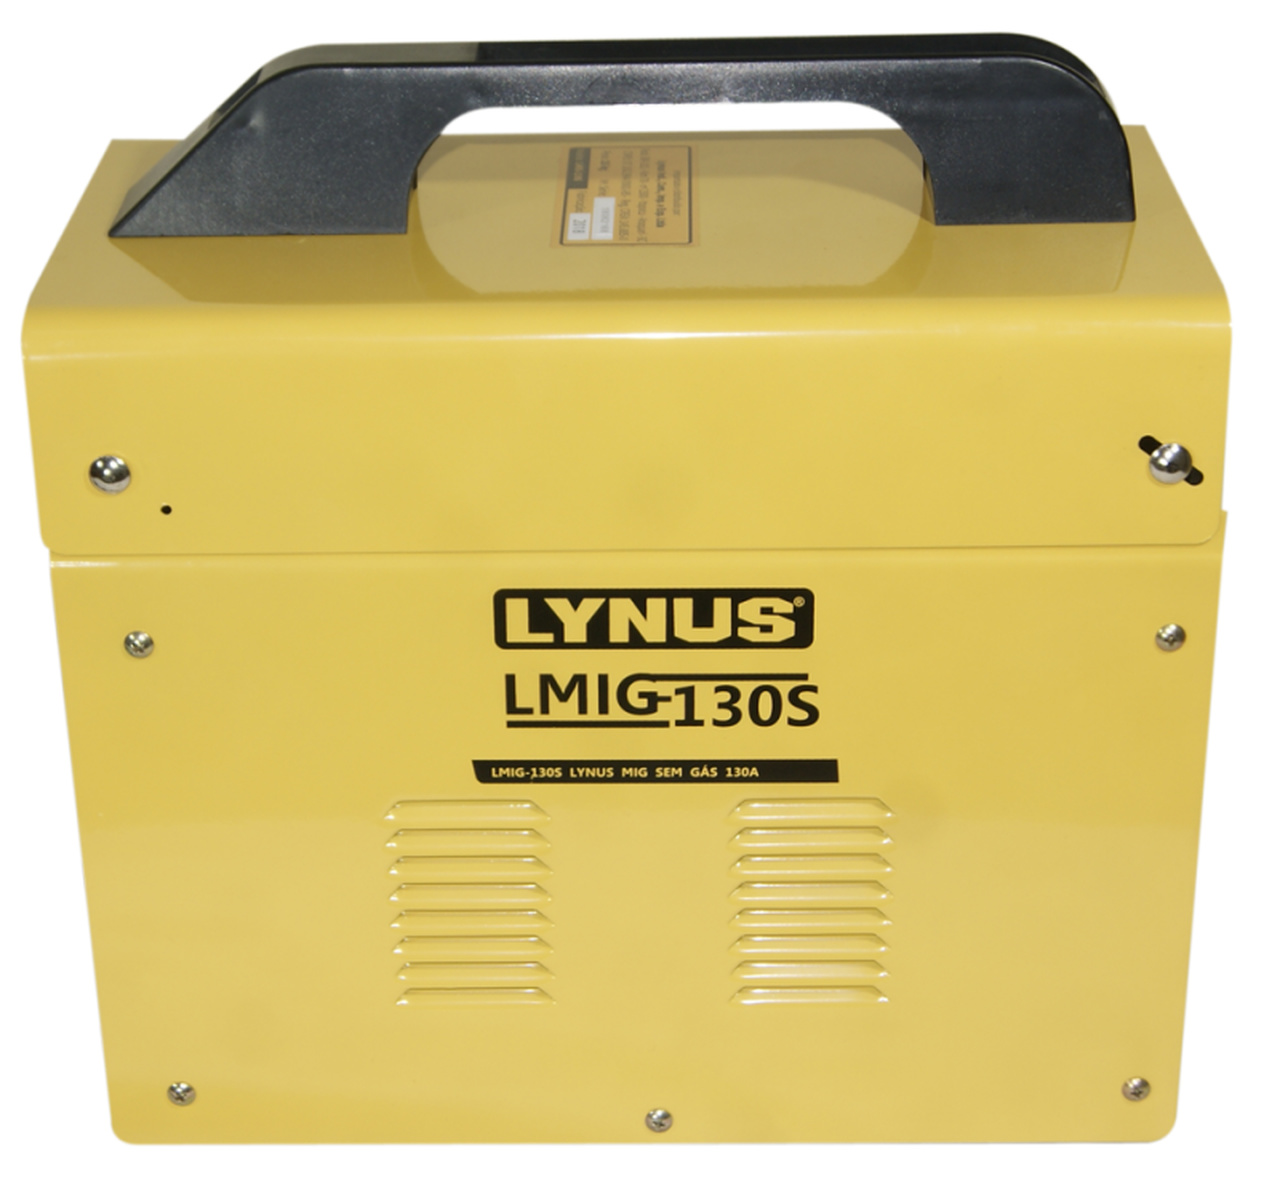 Solda mig sem gás 130a 220v Lynus 10972.5 Lmig-130s